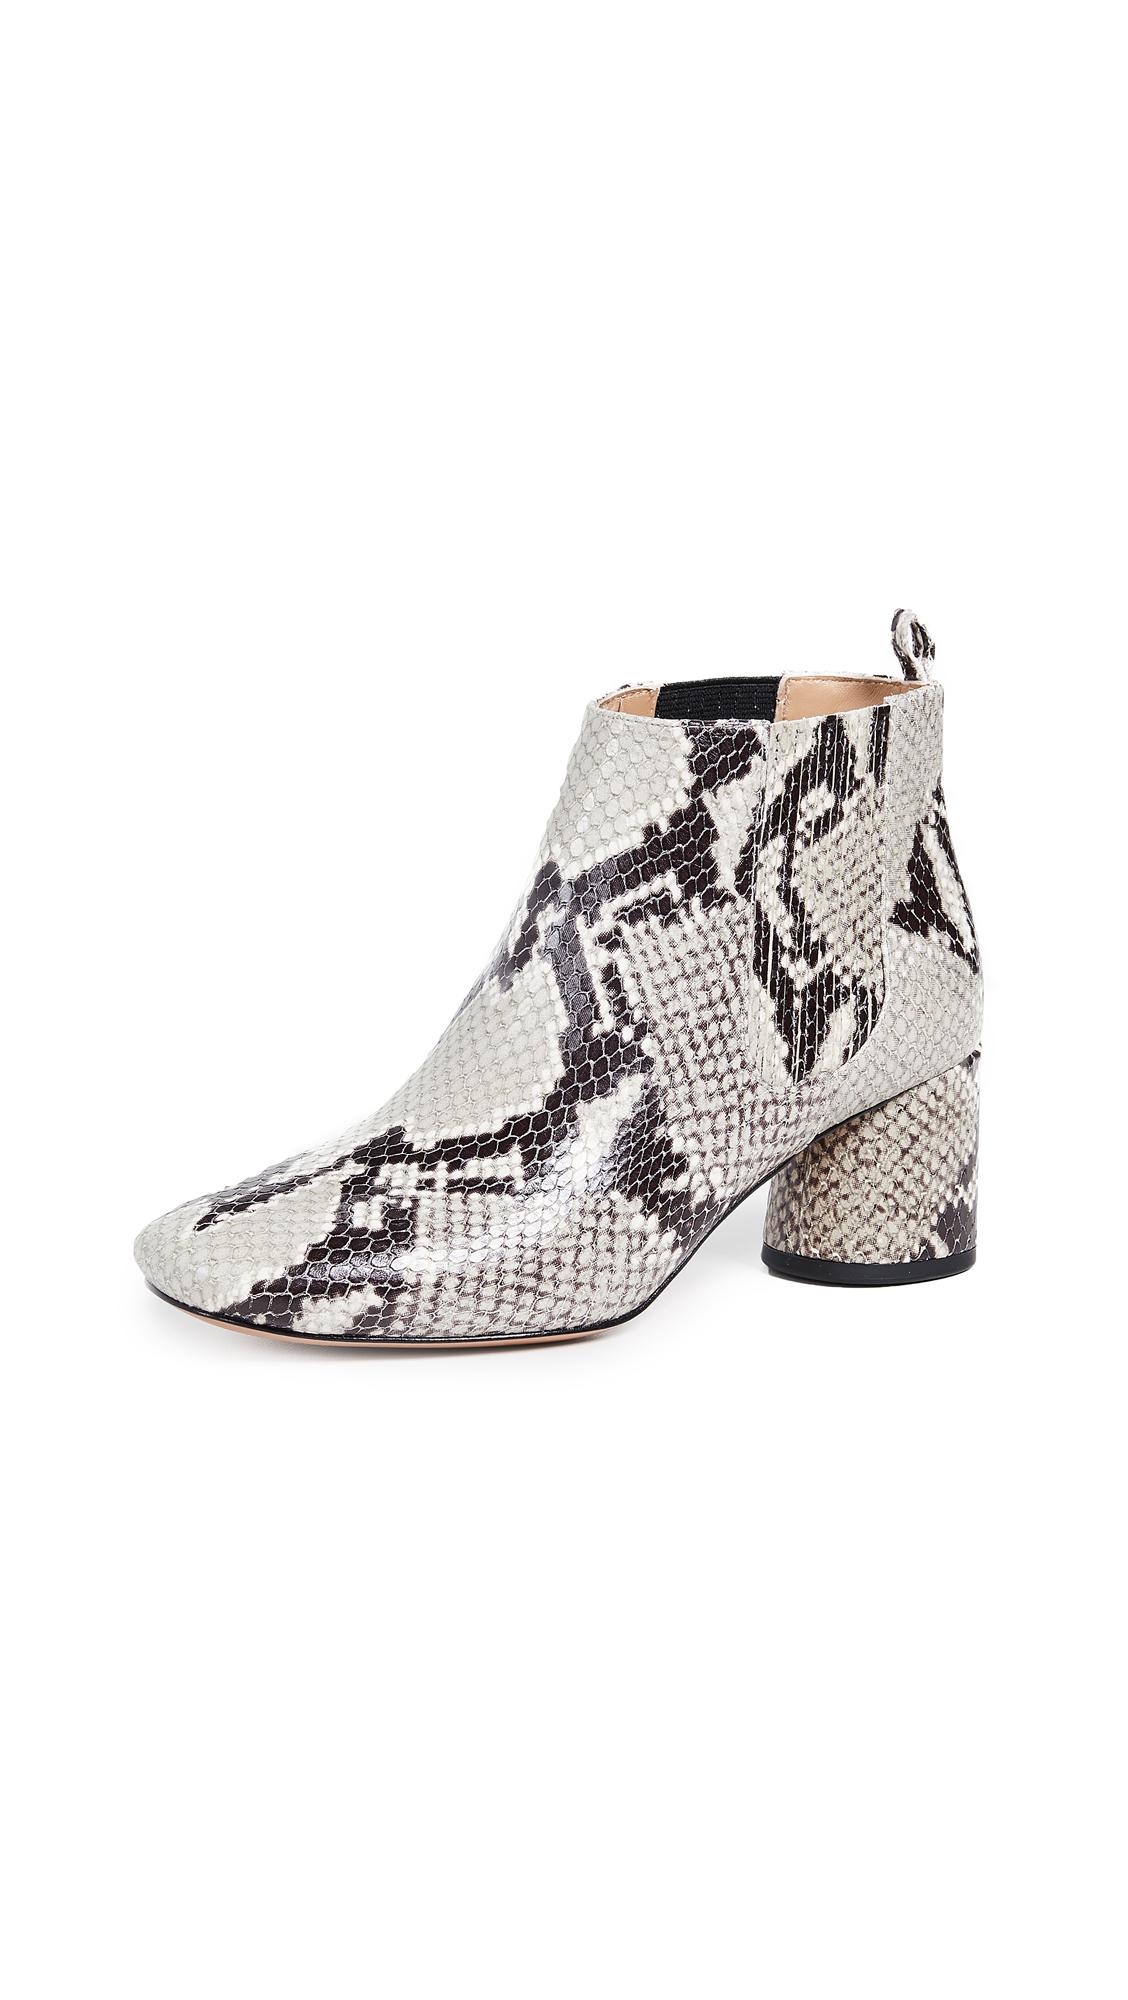 Marc Jacobs Rocket Chelsea Booties - Ivory Multi